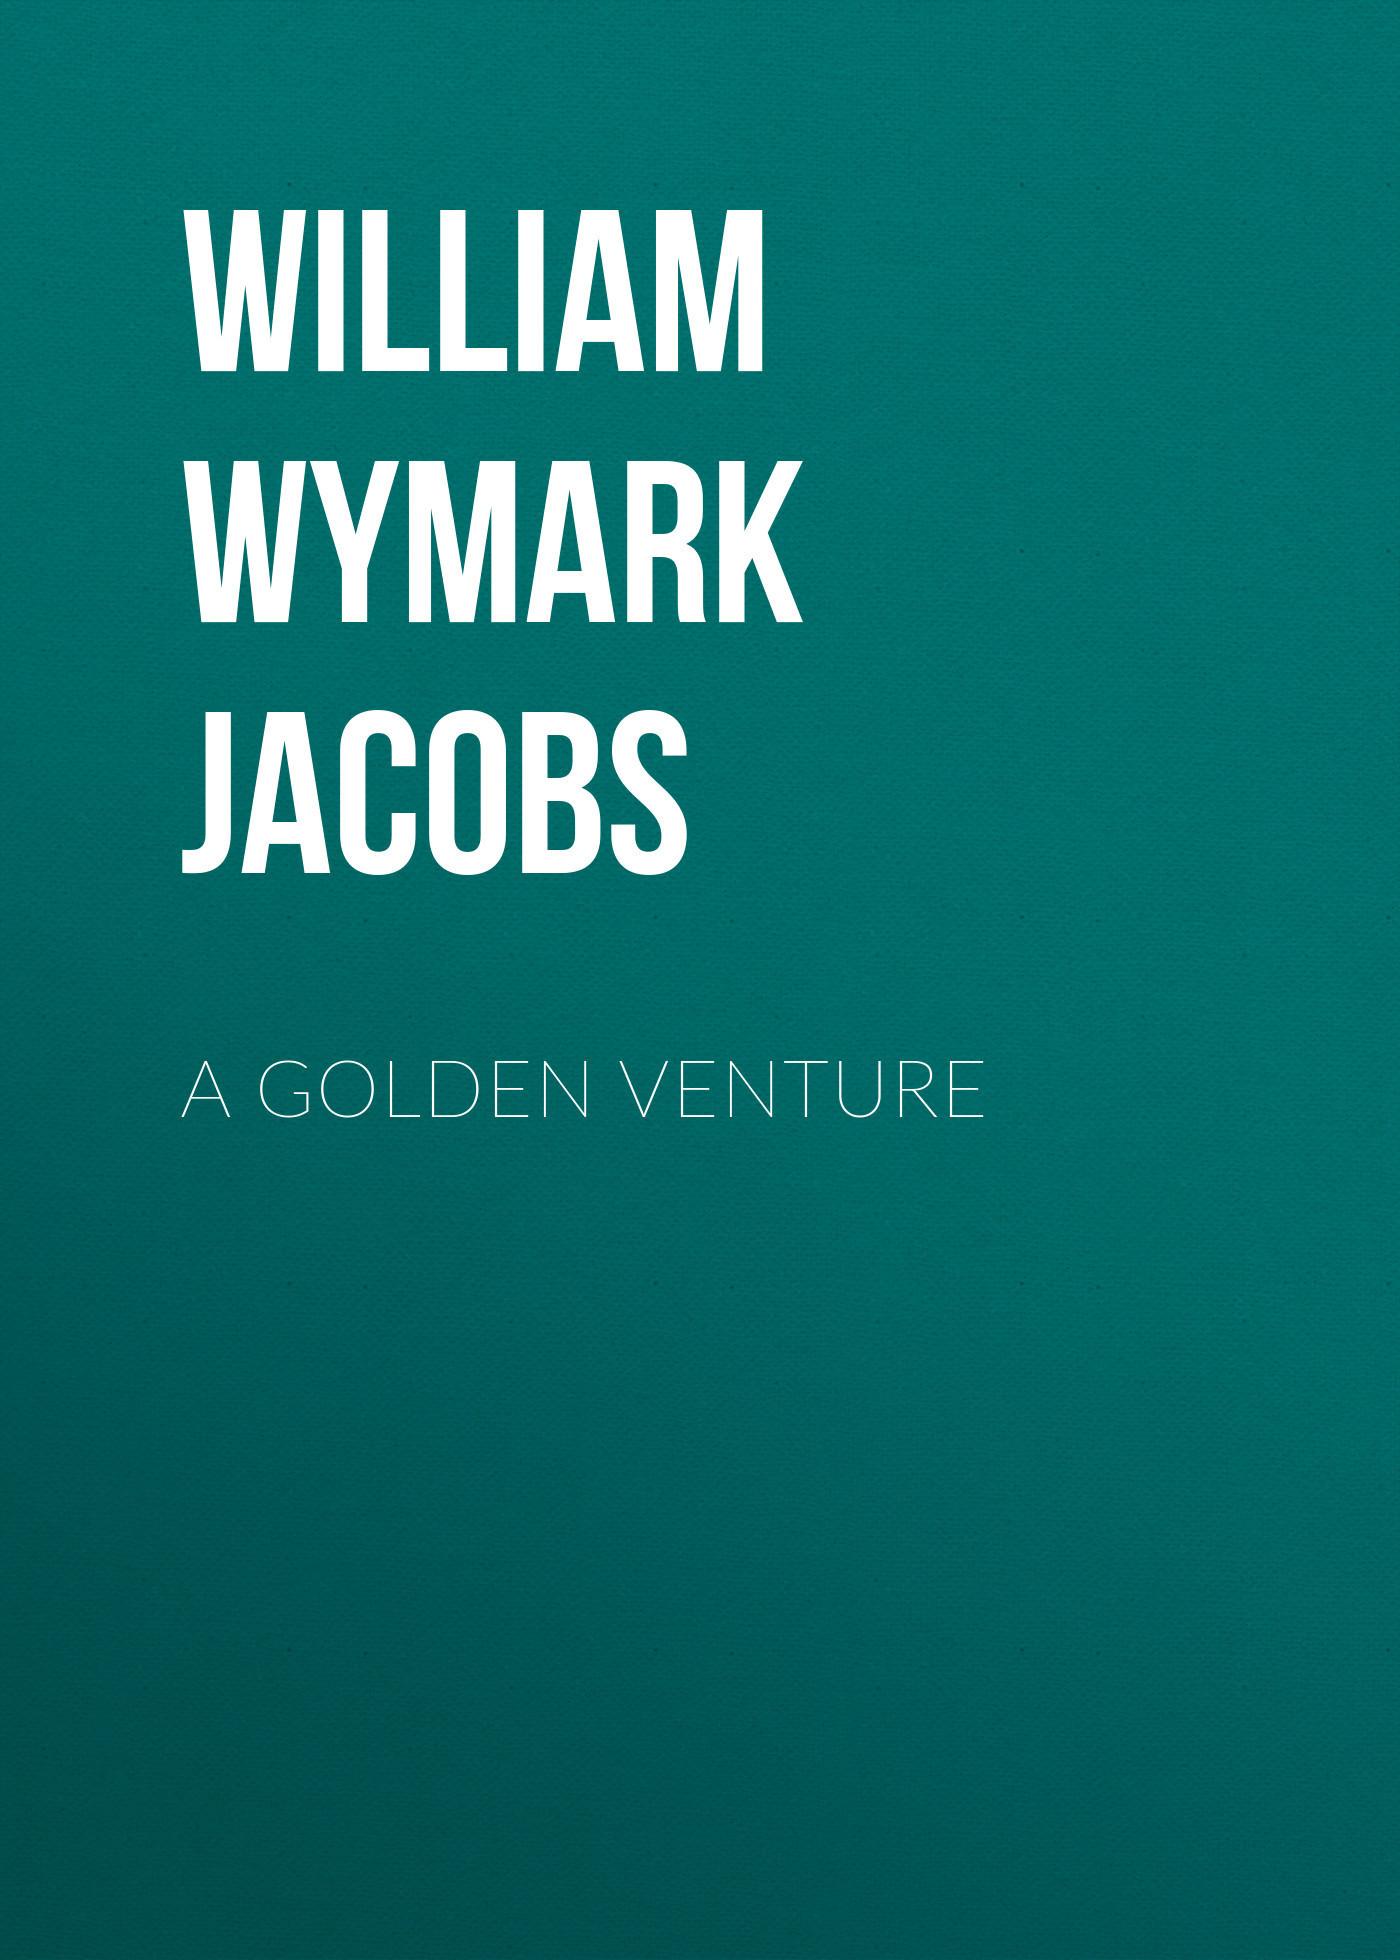 William Wymark Jacobs A Golden Venture venture